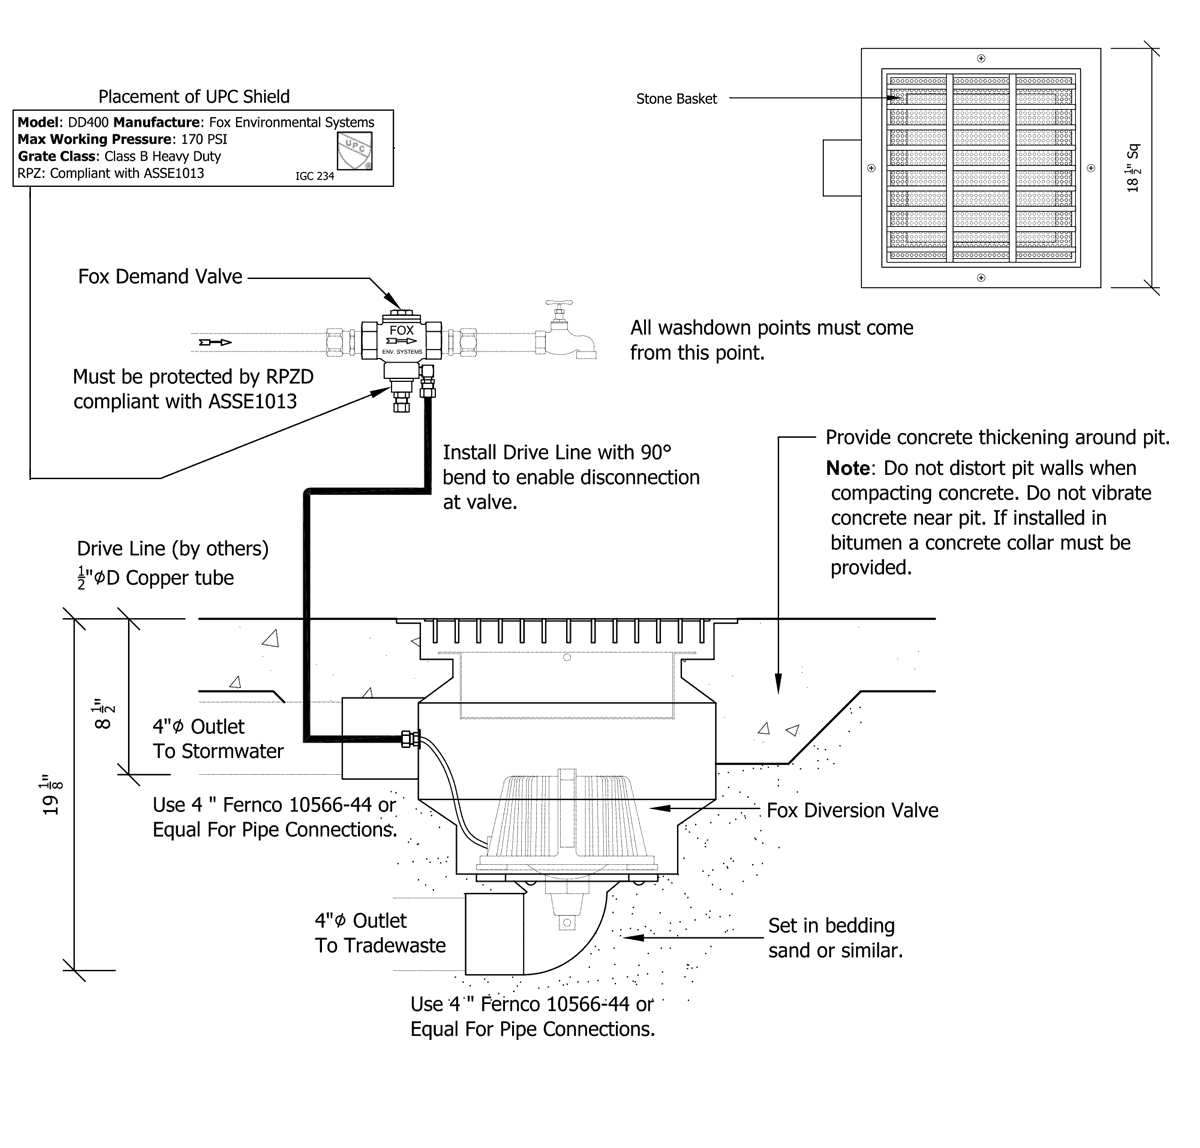 DD400 Washdown System Schematic